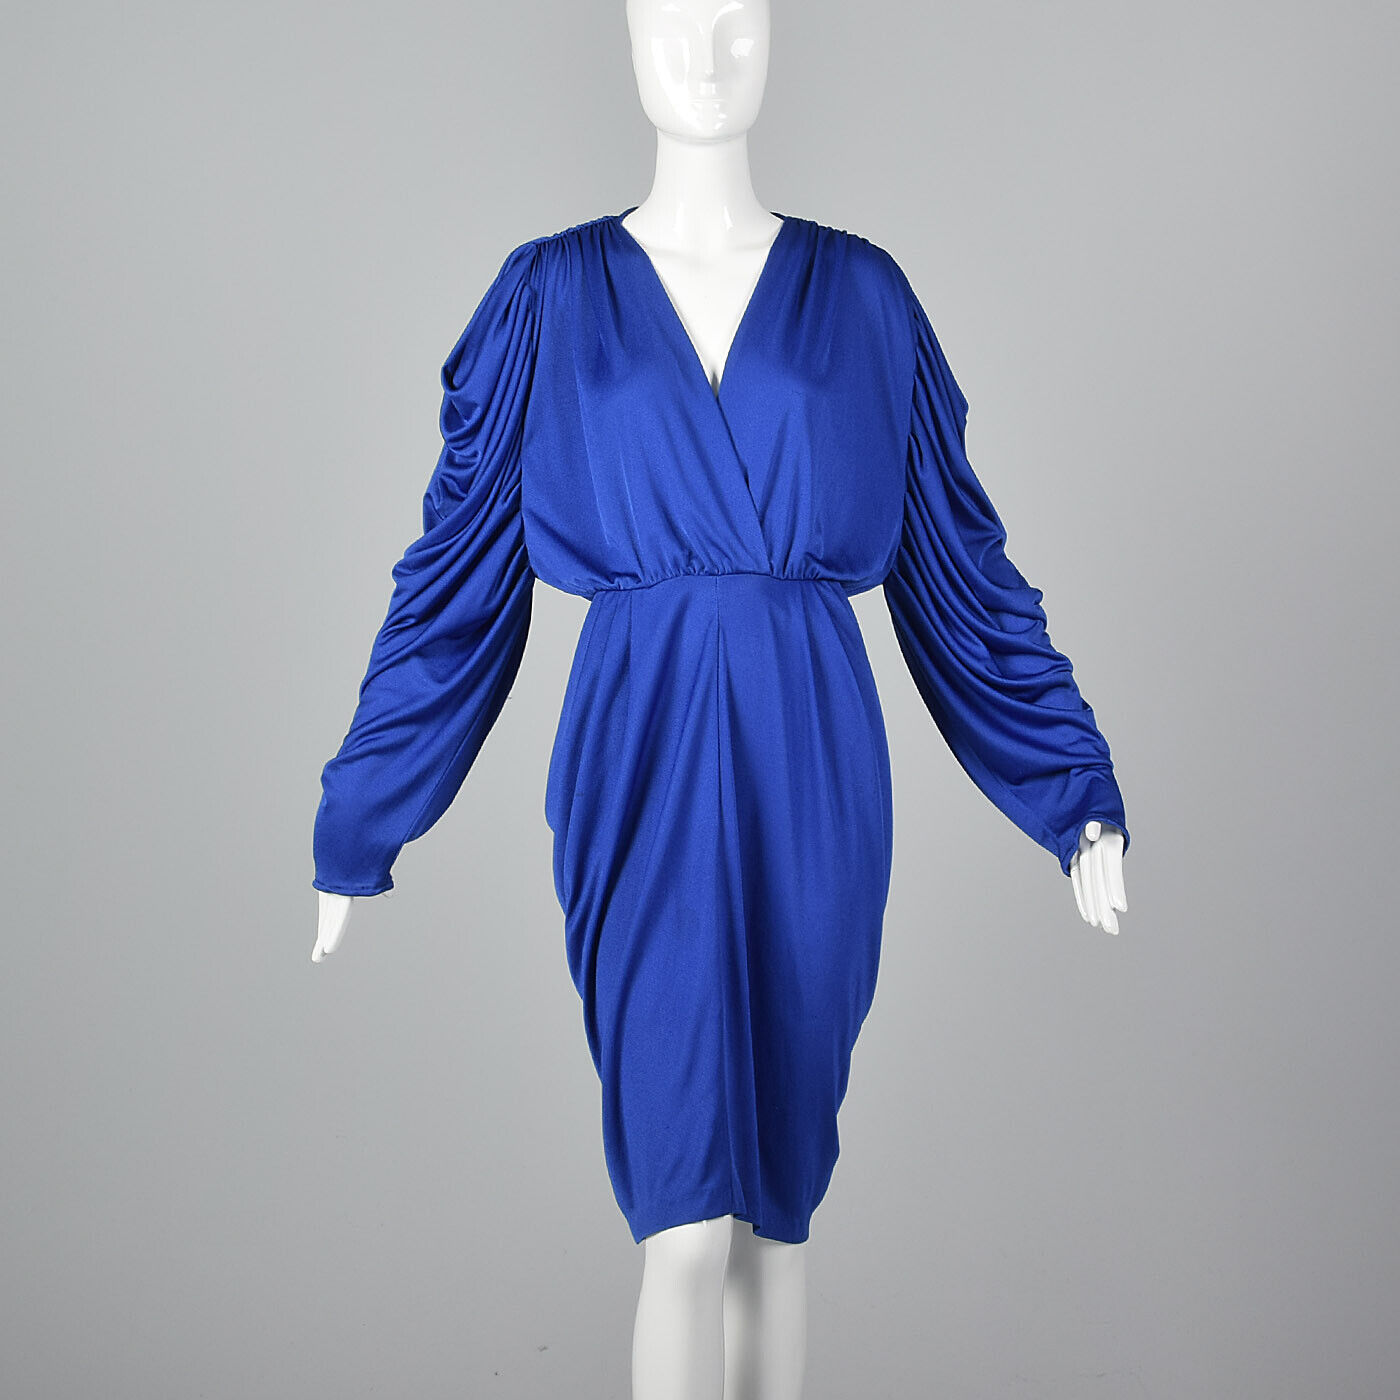 M 1980s Joseph Magnin Blau Harem Dress Long Sleeves Pencil Skirt Evening 80s VTG